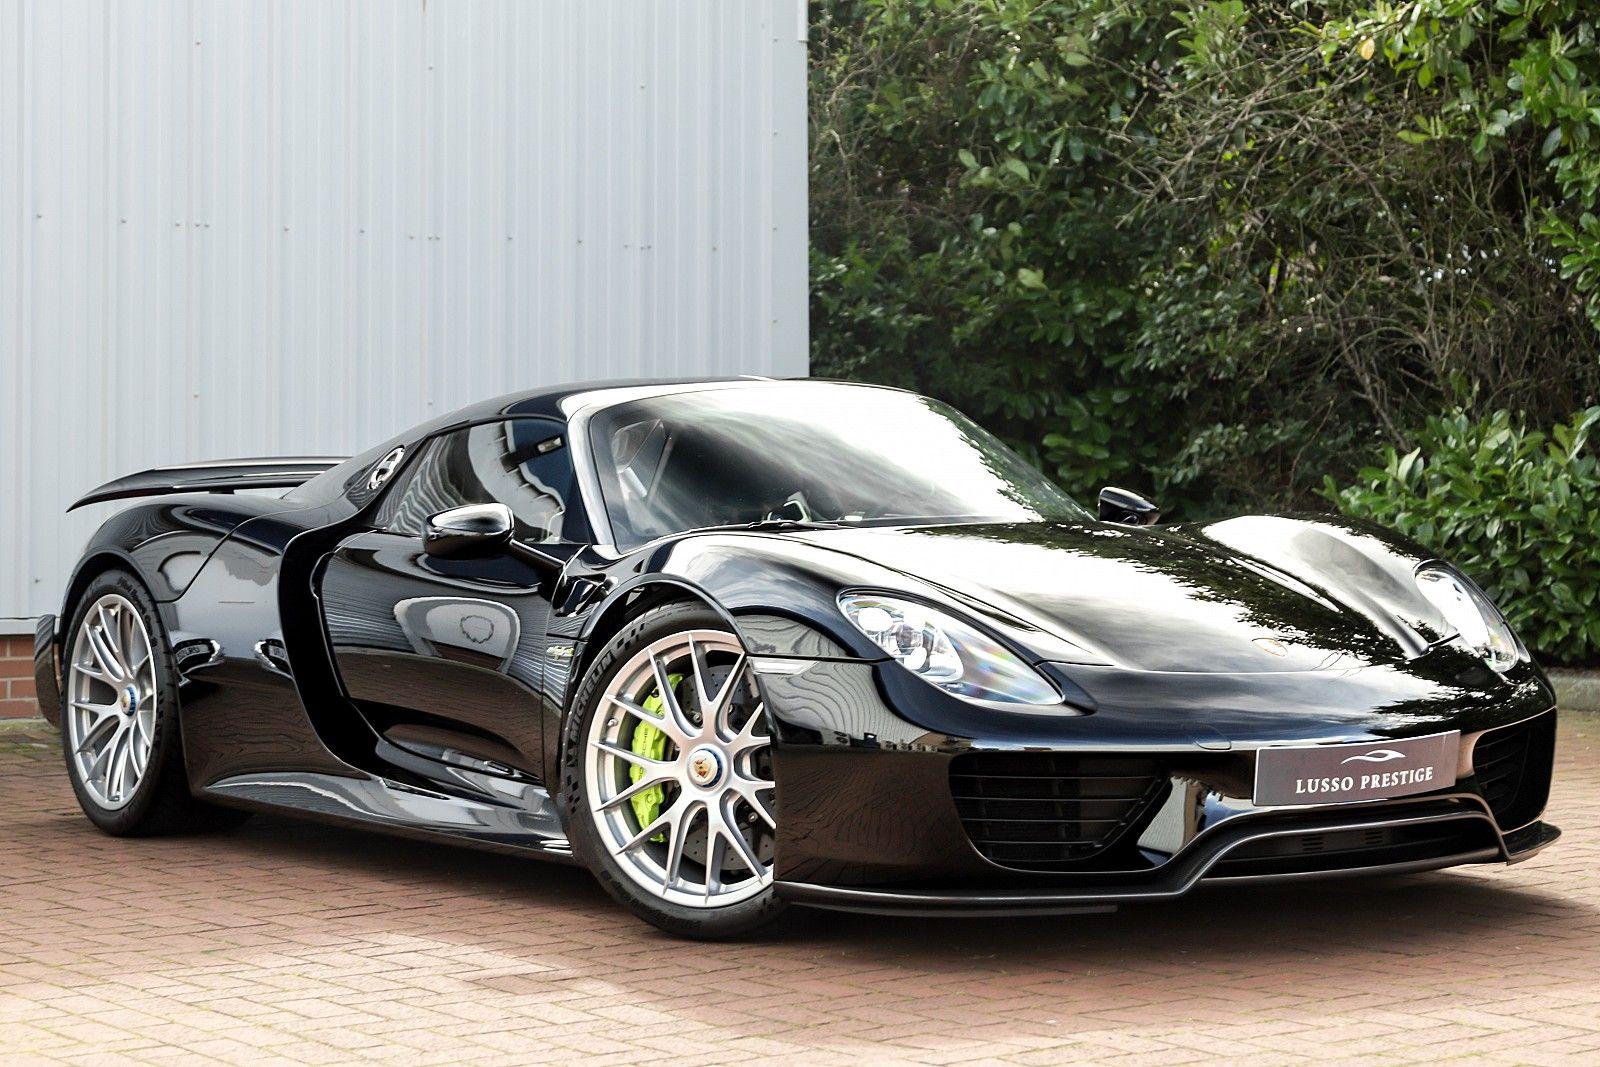 Porsche 918 Spyder Weissach Package Lusso Prestige Ltd United Kingdom For Sale On Luxurypulse In 2020 Porsche 918 Porsche Porsche Cars